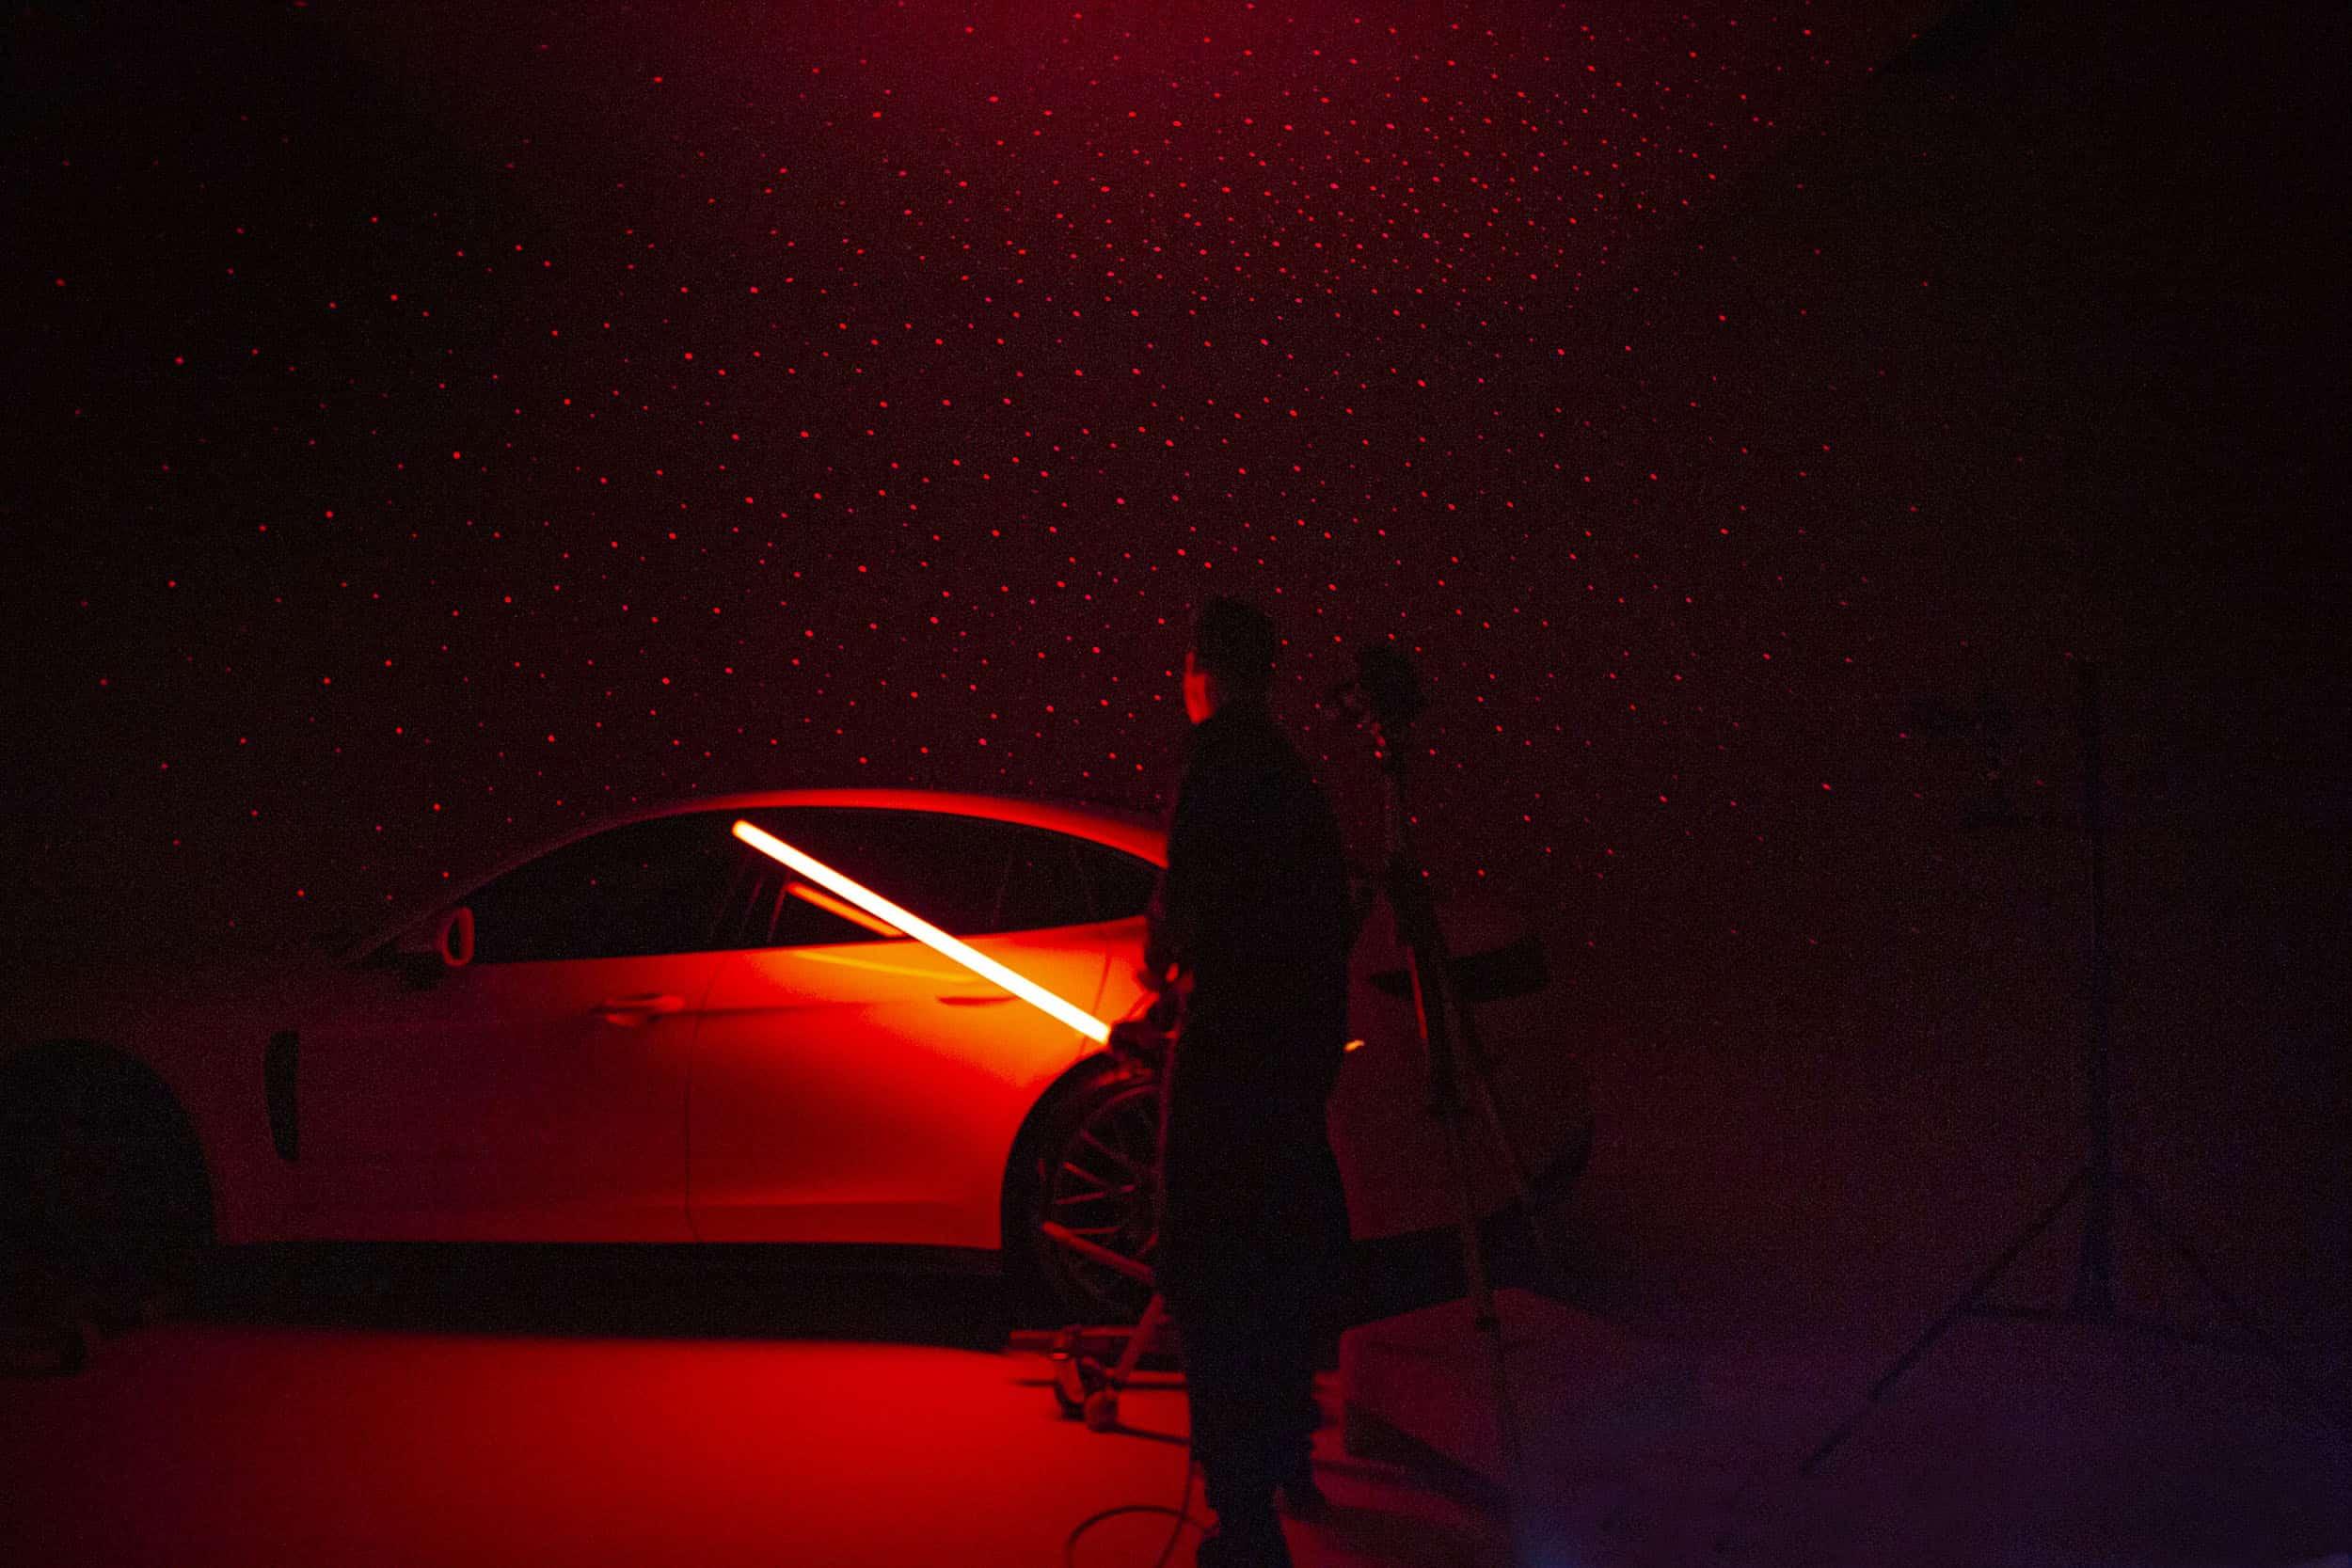 studio-ignatov-wkw-automotive-imagekampagne-makingof-03